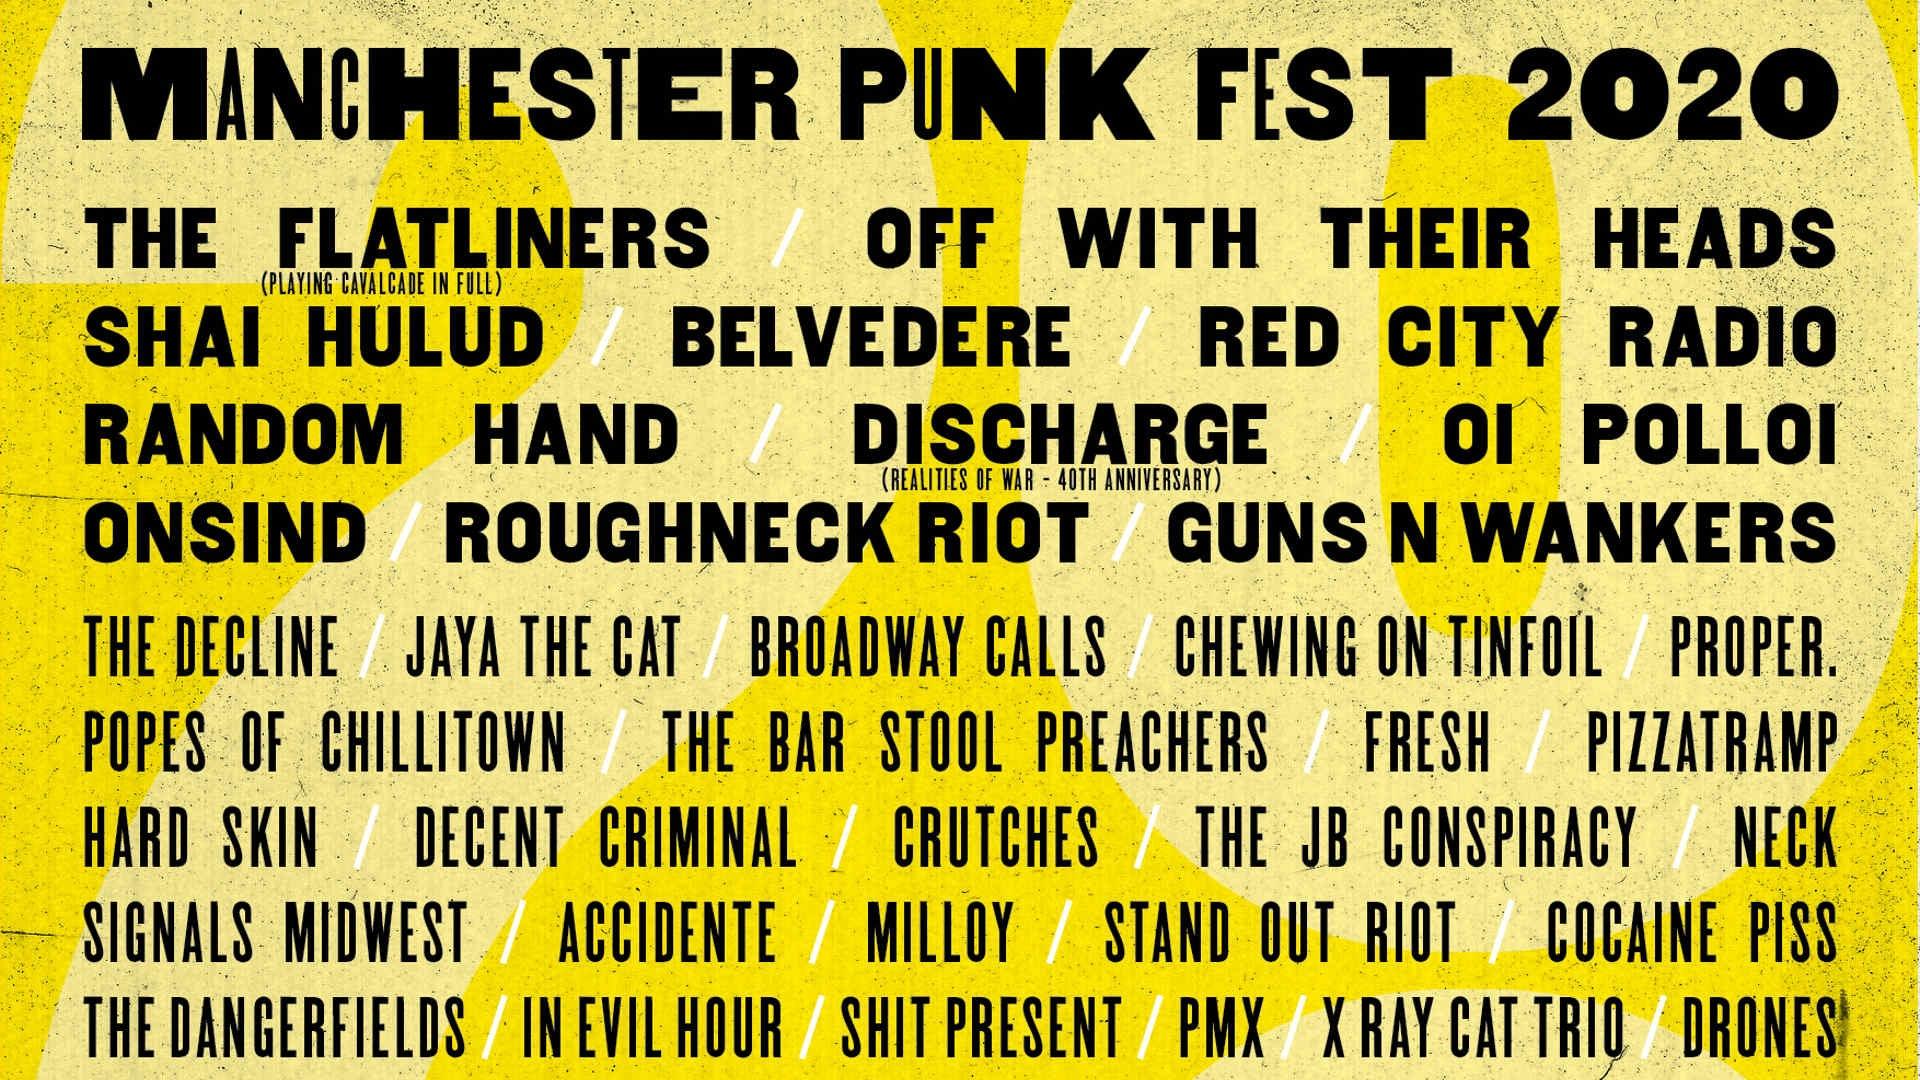 Manchester Punk Festival 2020